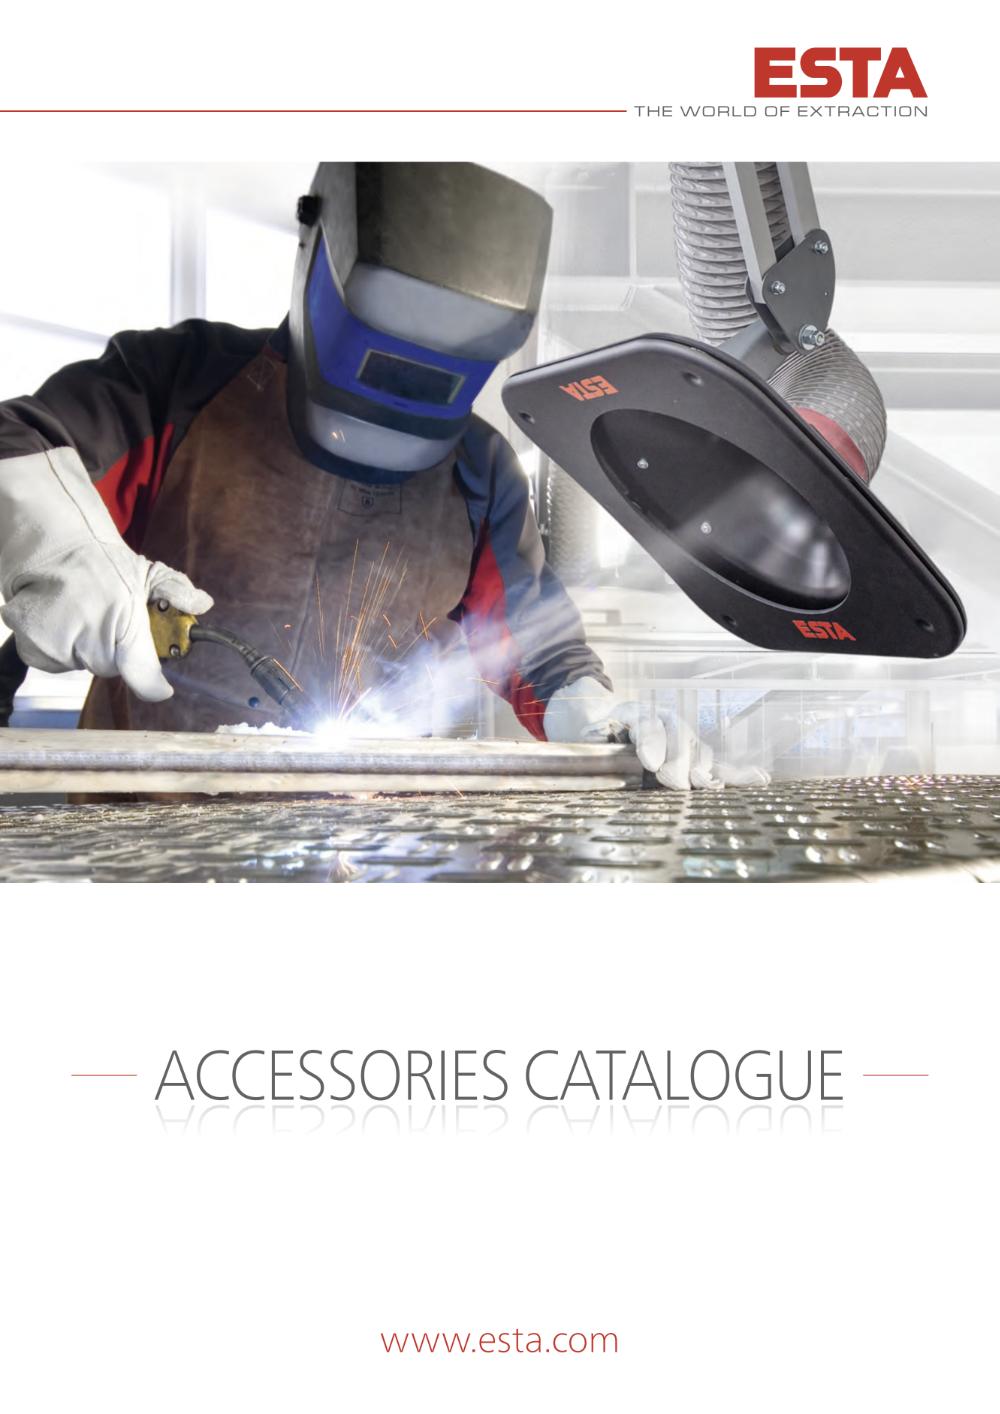 ESTA Accessories Catalogue